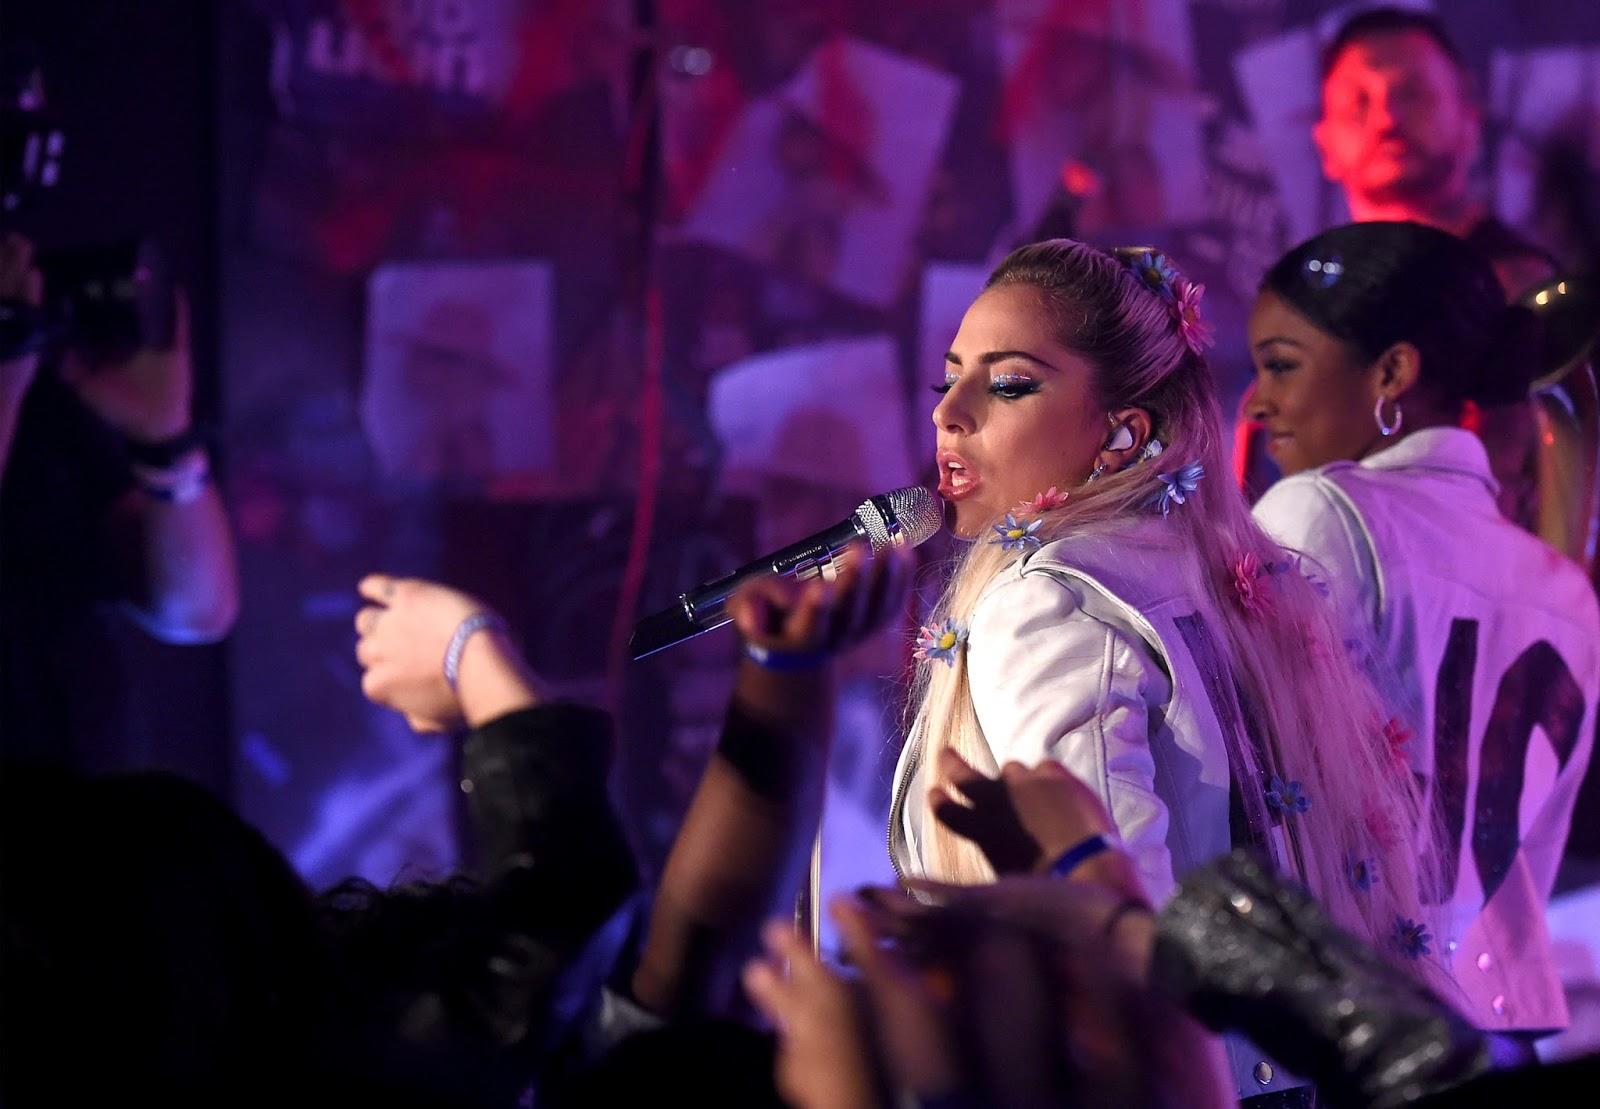 WATCH: Lady Gaga's Unseen Dive Bar Tour Performance